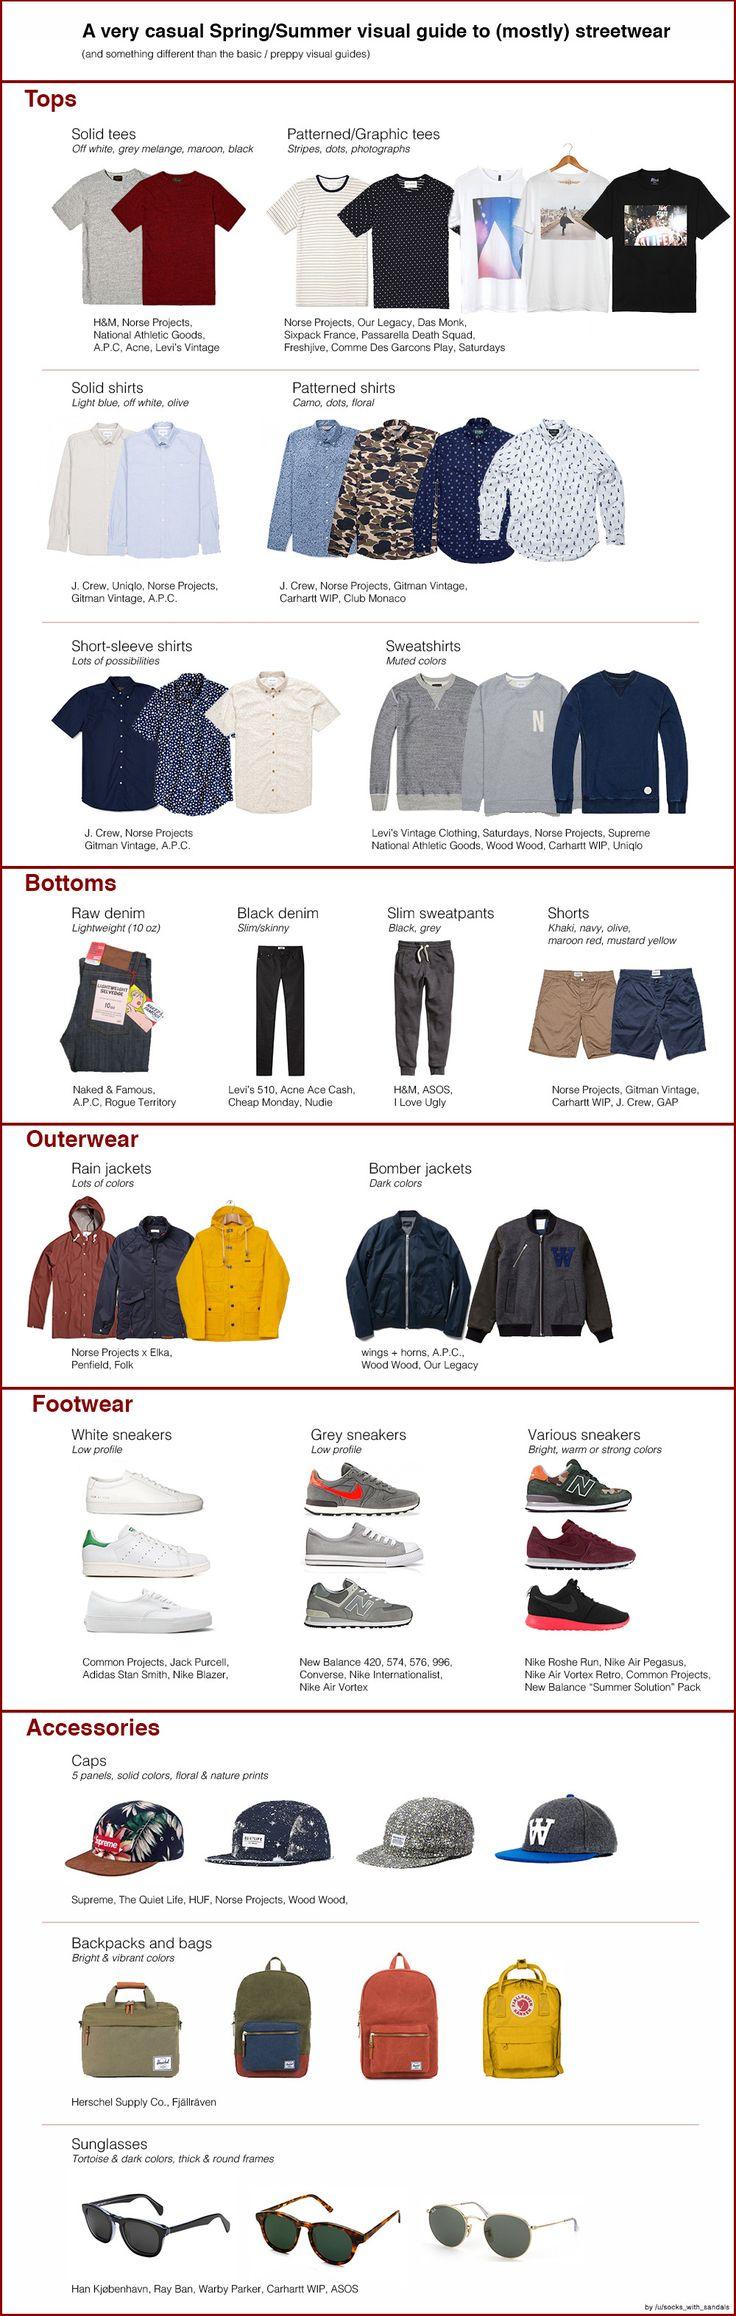 Casual Streetwear Spring / Summer Guide by sockswithsandals